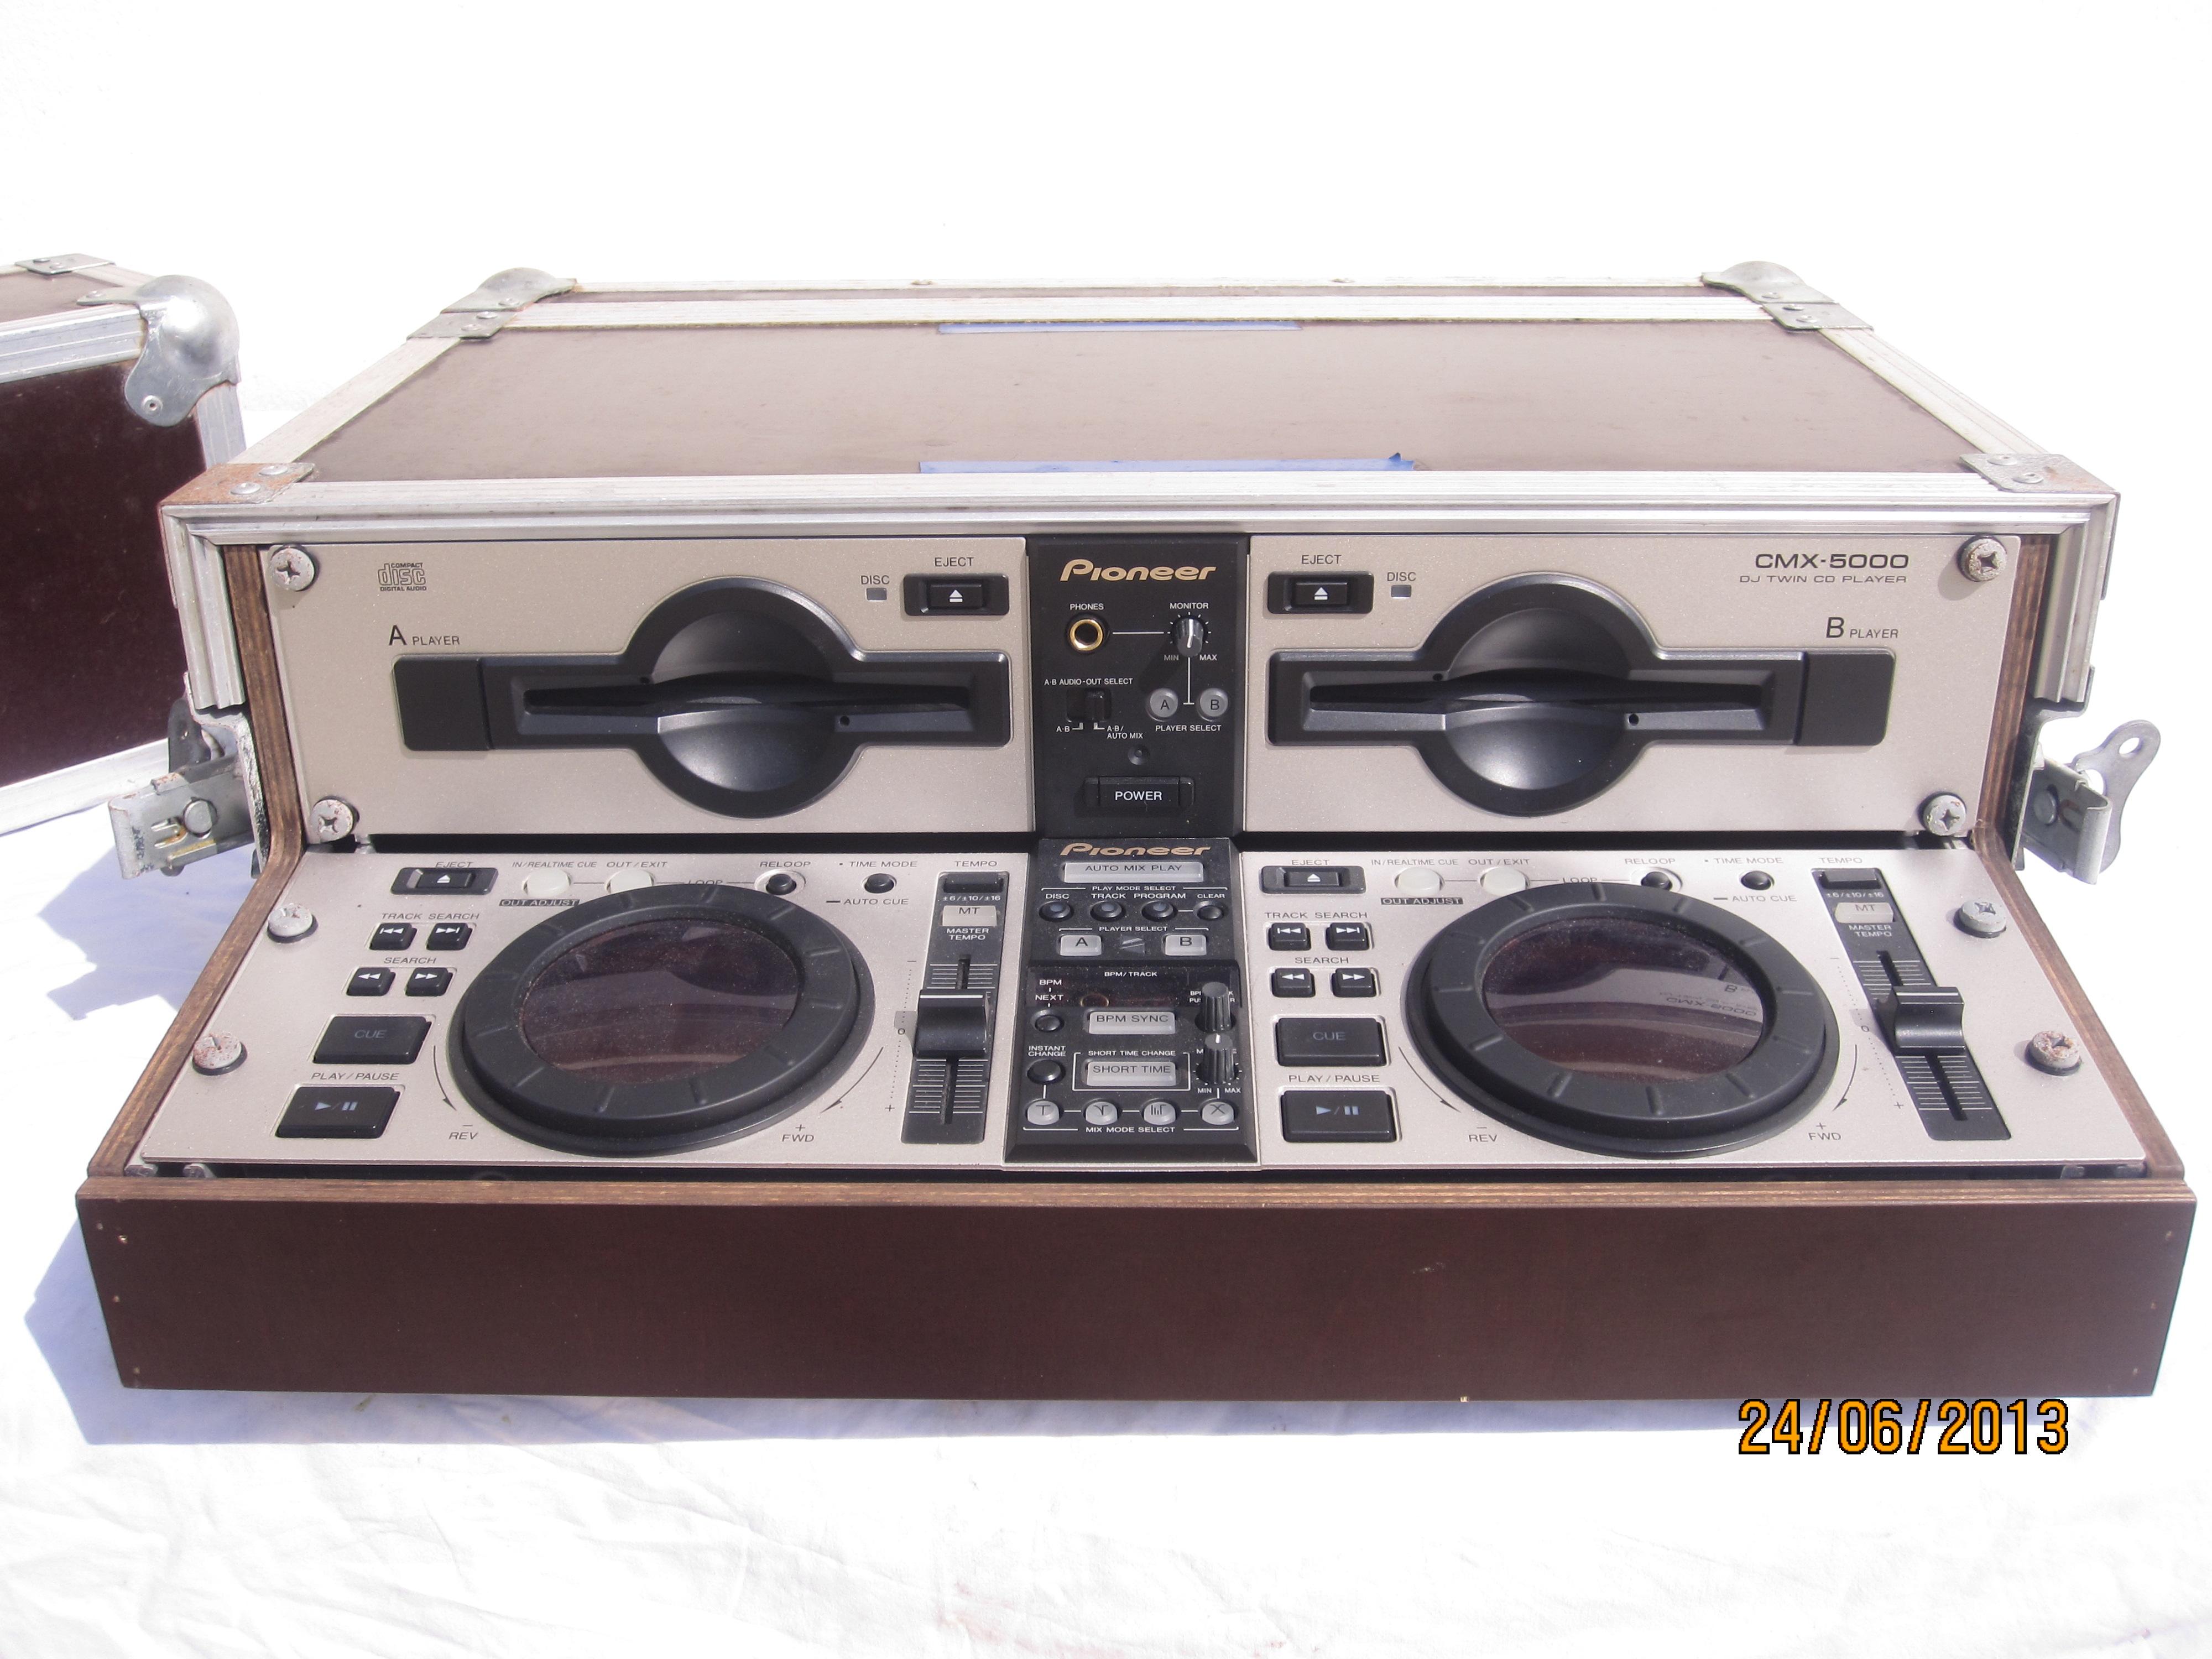 double lecteur cd pioneer cmx 5000 ile de france. Black Bedroom Furniture Sets. Home Design Ideas